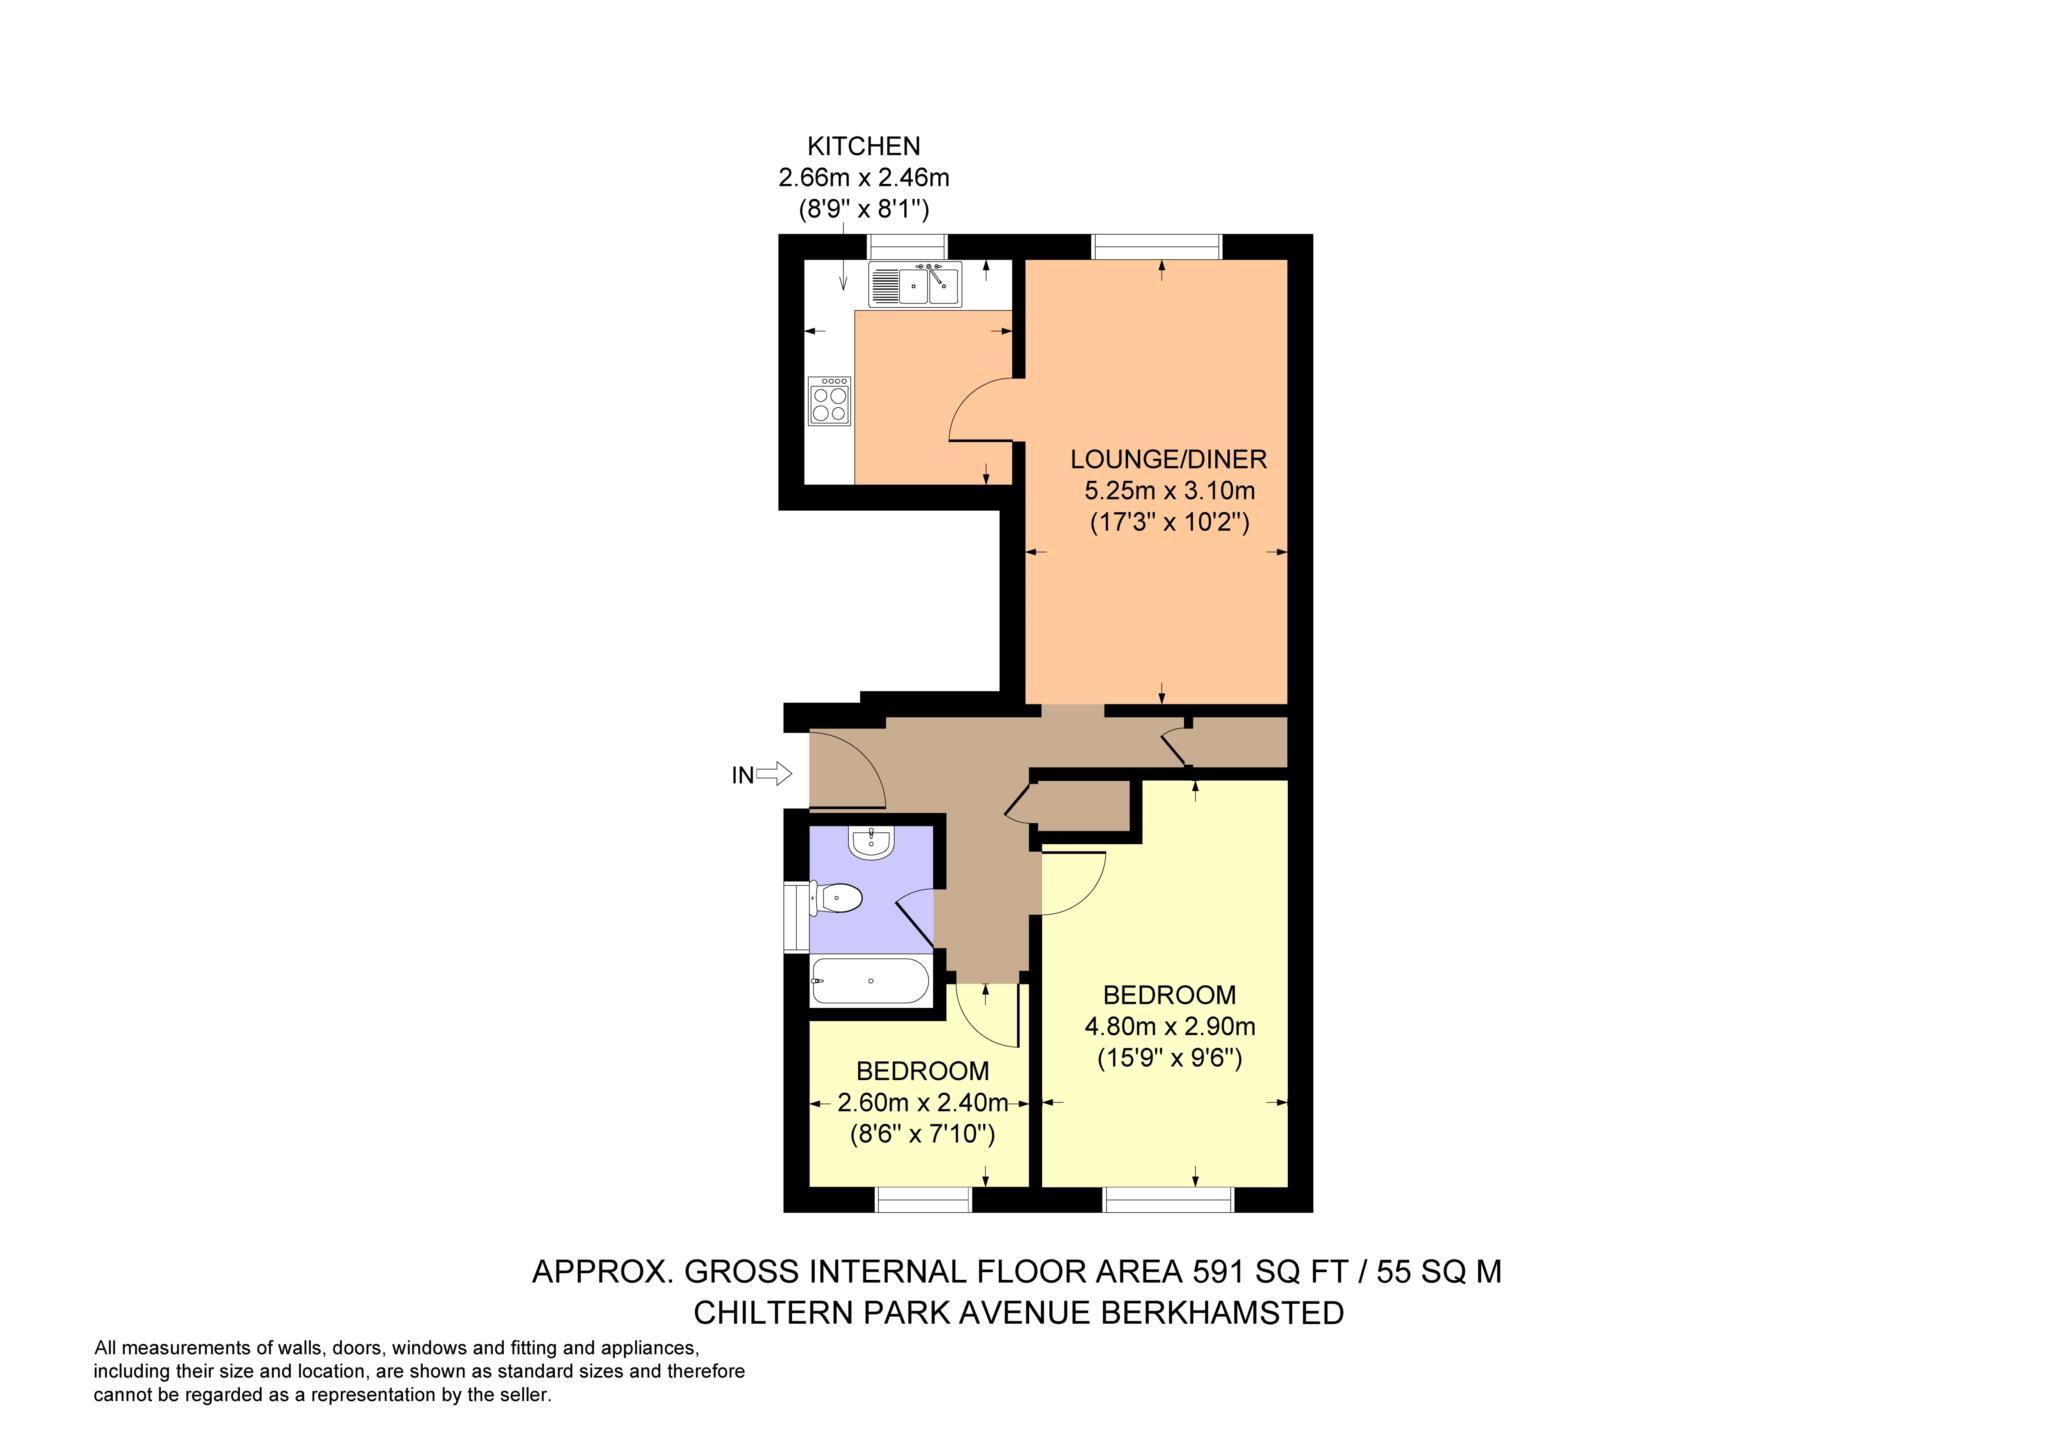 Property To Rent Chiltern Park Avenue Berkhamsted Little London Estates Id 10000003